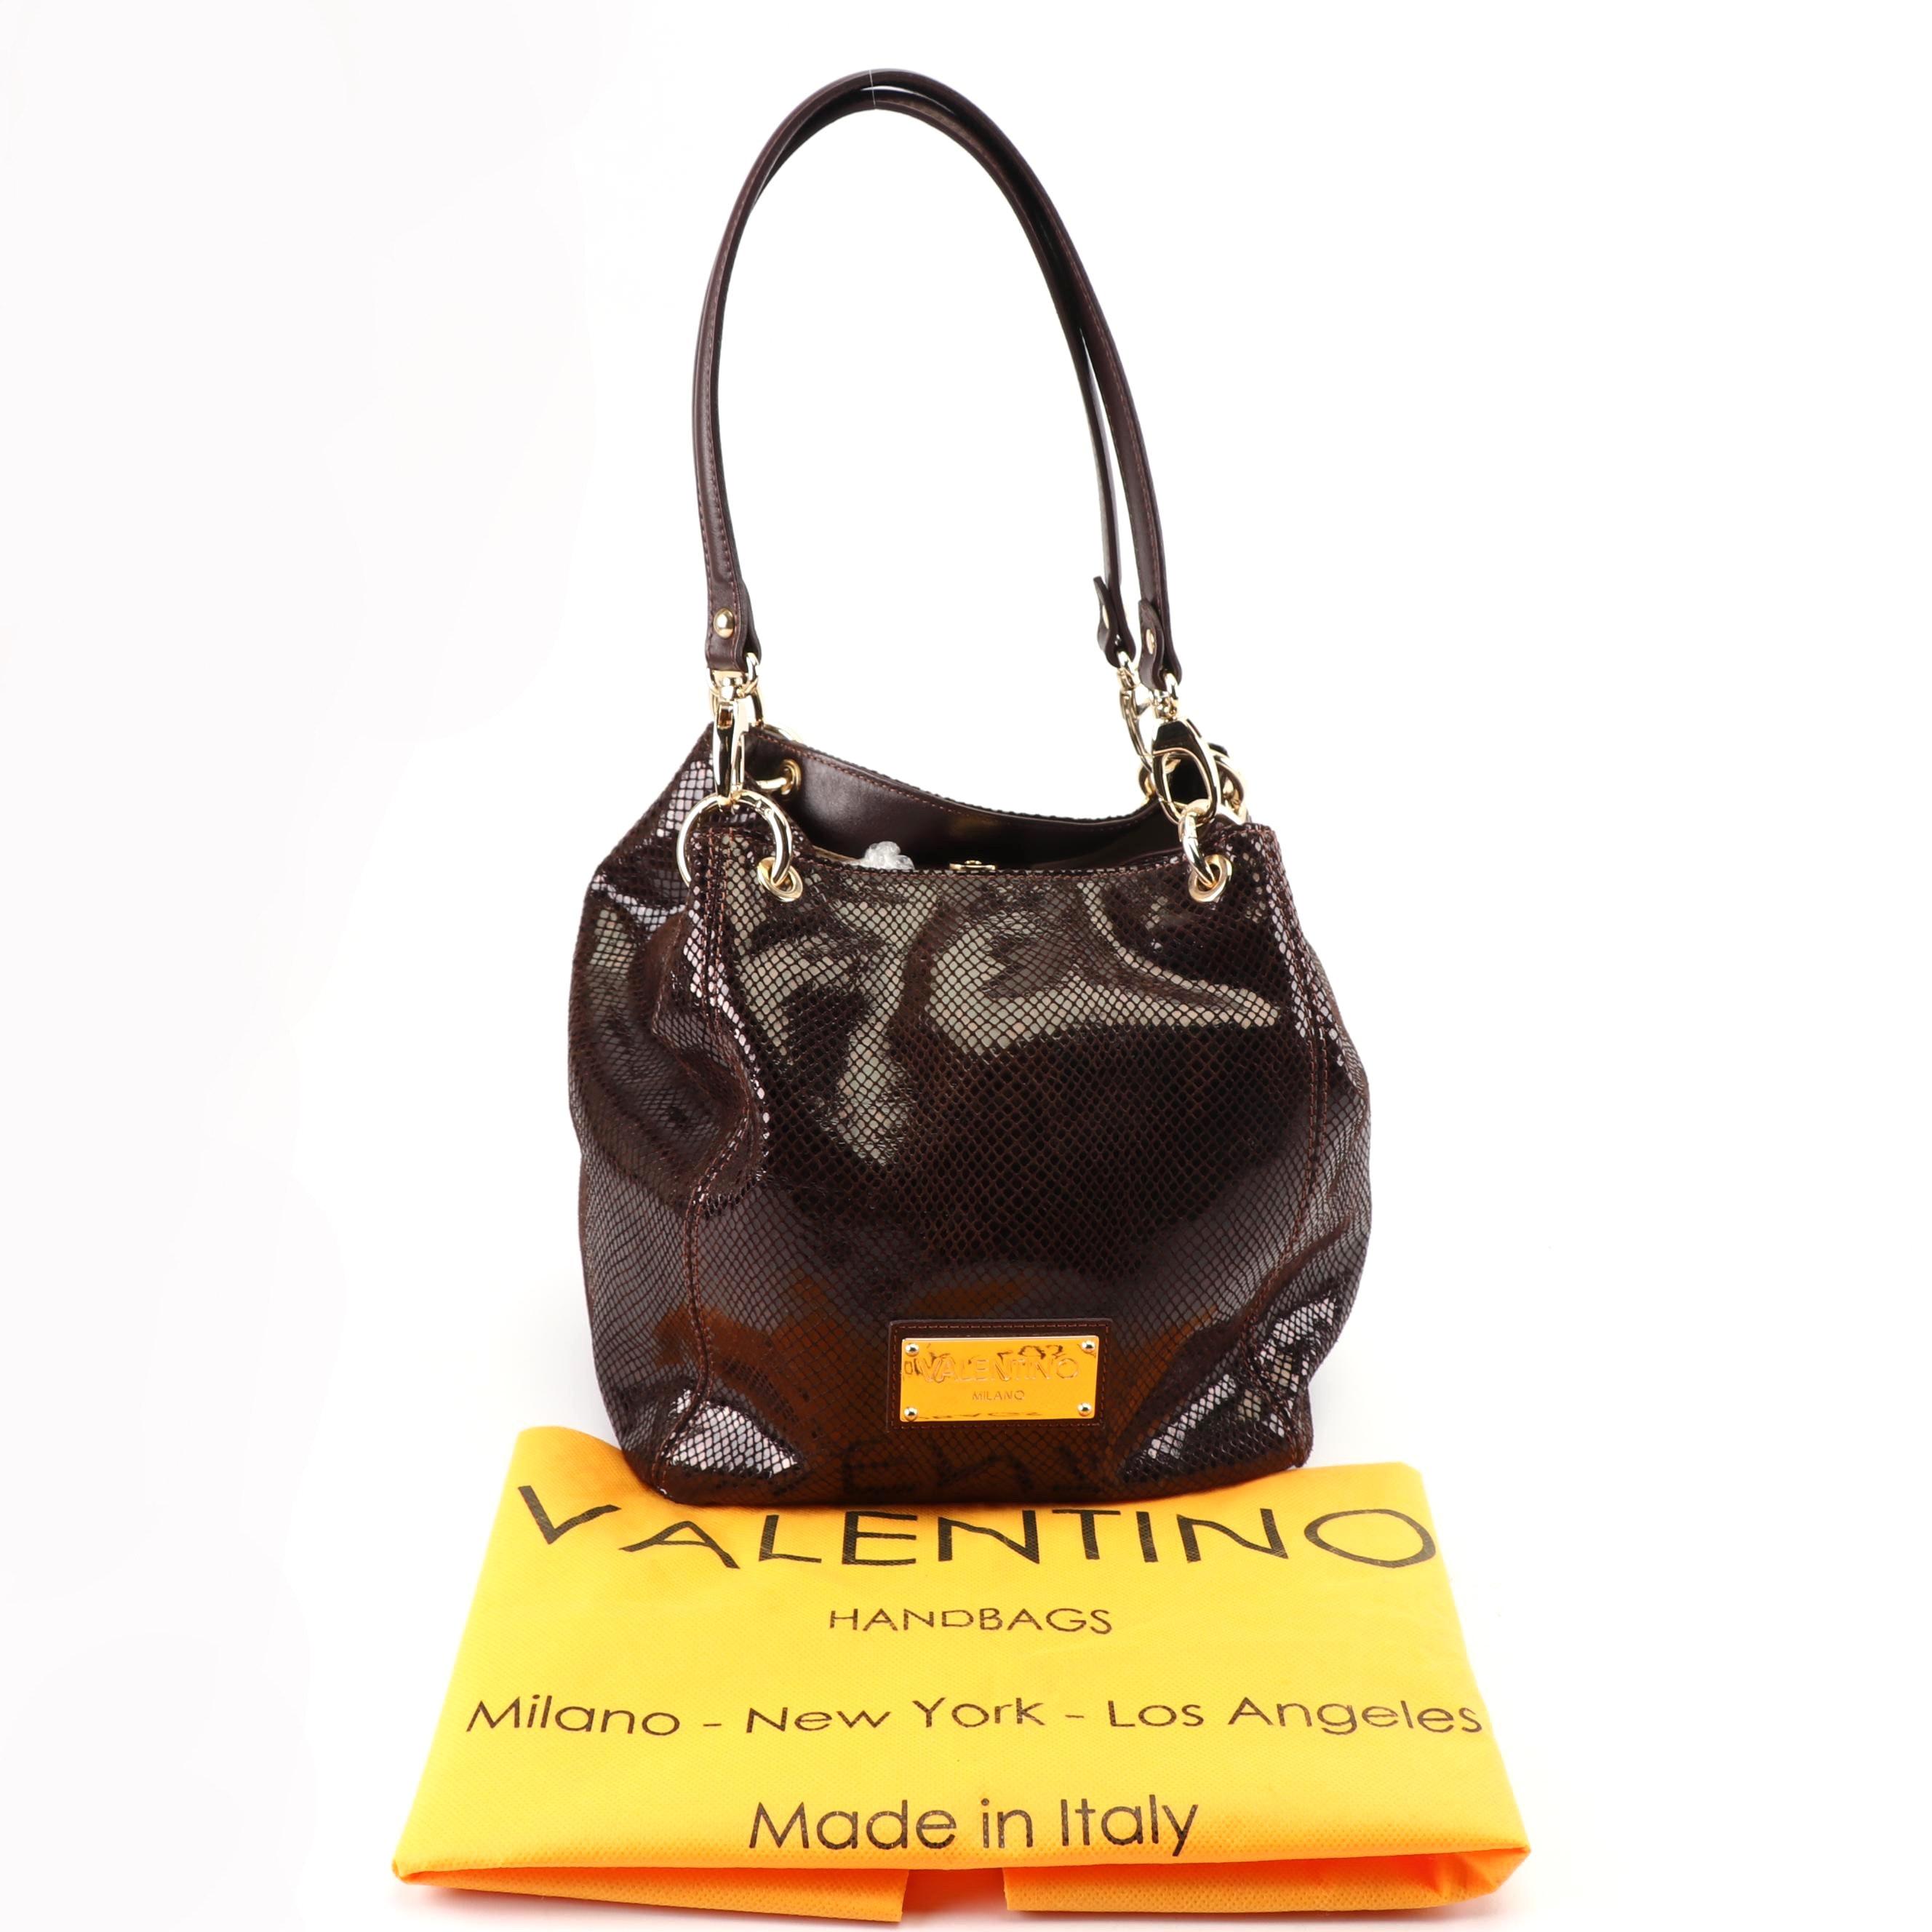 Mario Valentino Spa Bag Faux Snakeskin Burgundy Leather Top Handled Handbag